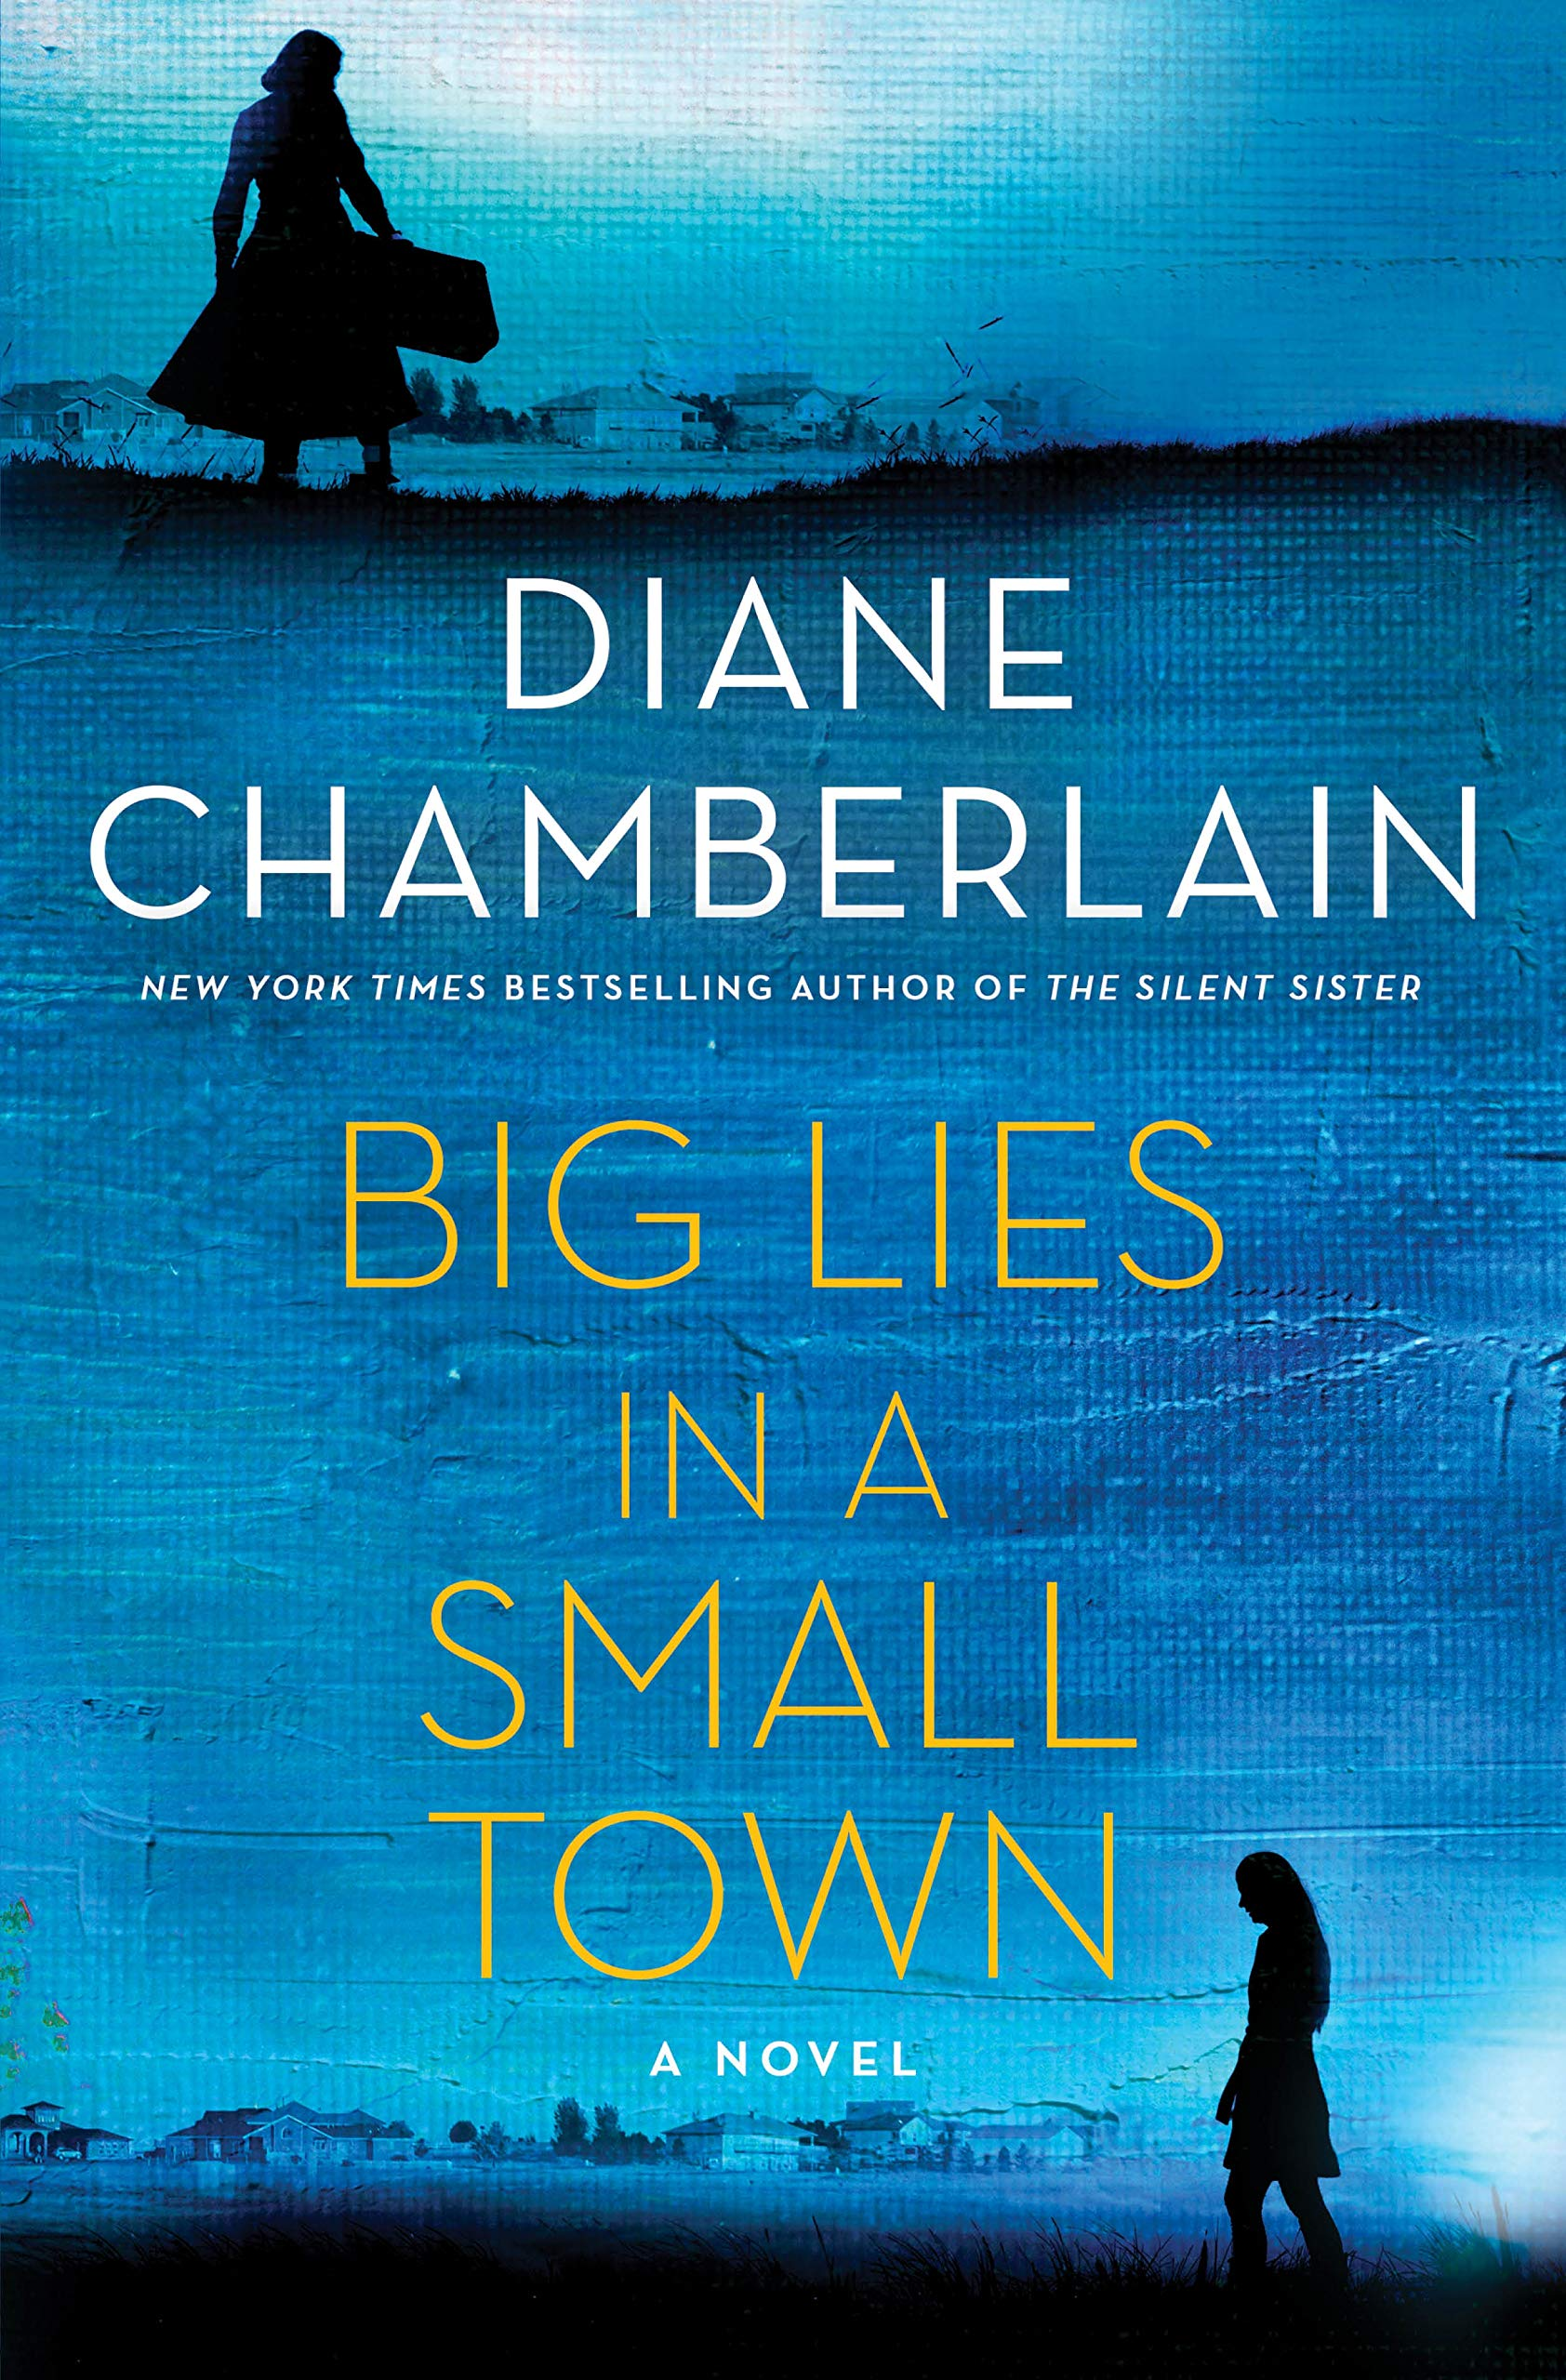 Big Lies in a Small Town: A Novel